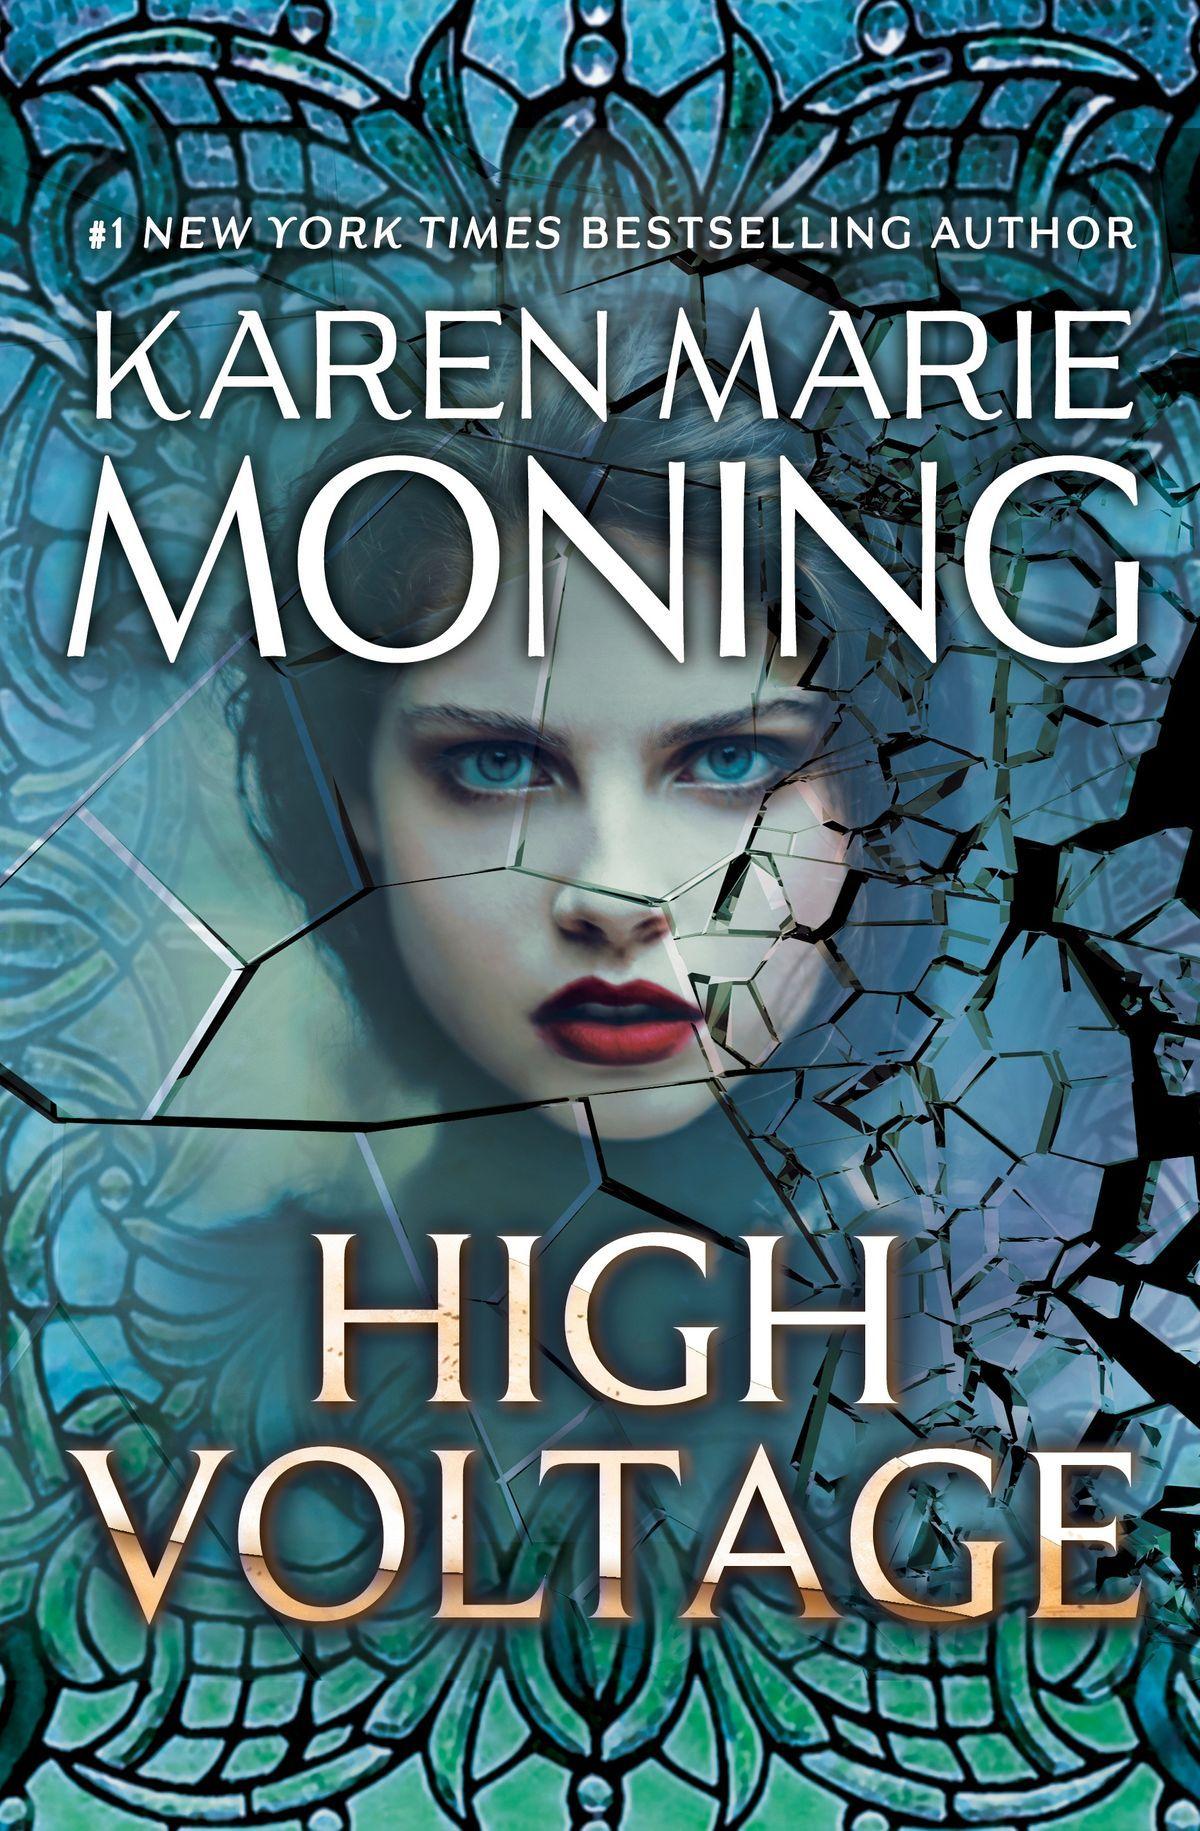 High Voltage Karen Marie Moning pdf, High Voltage Karen Marie Moning